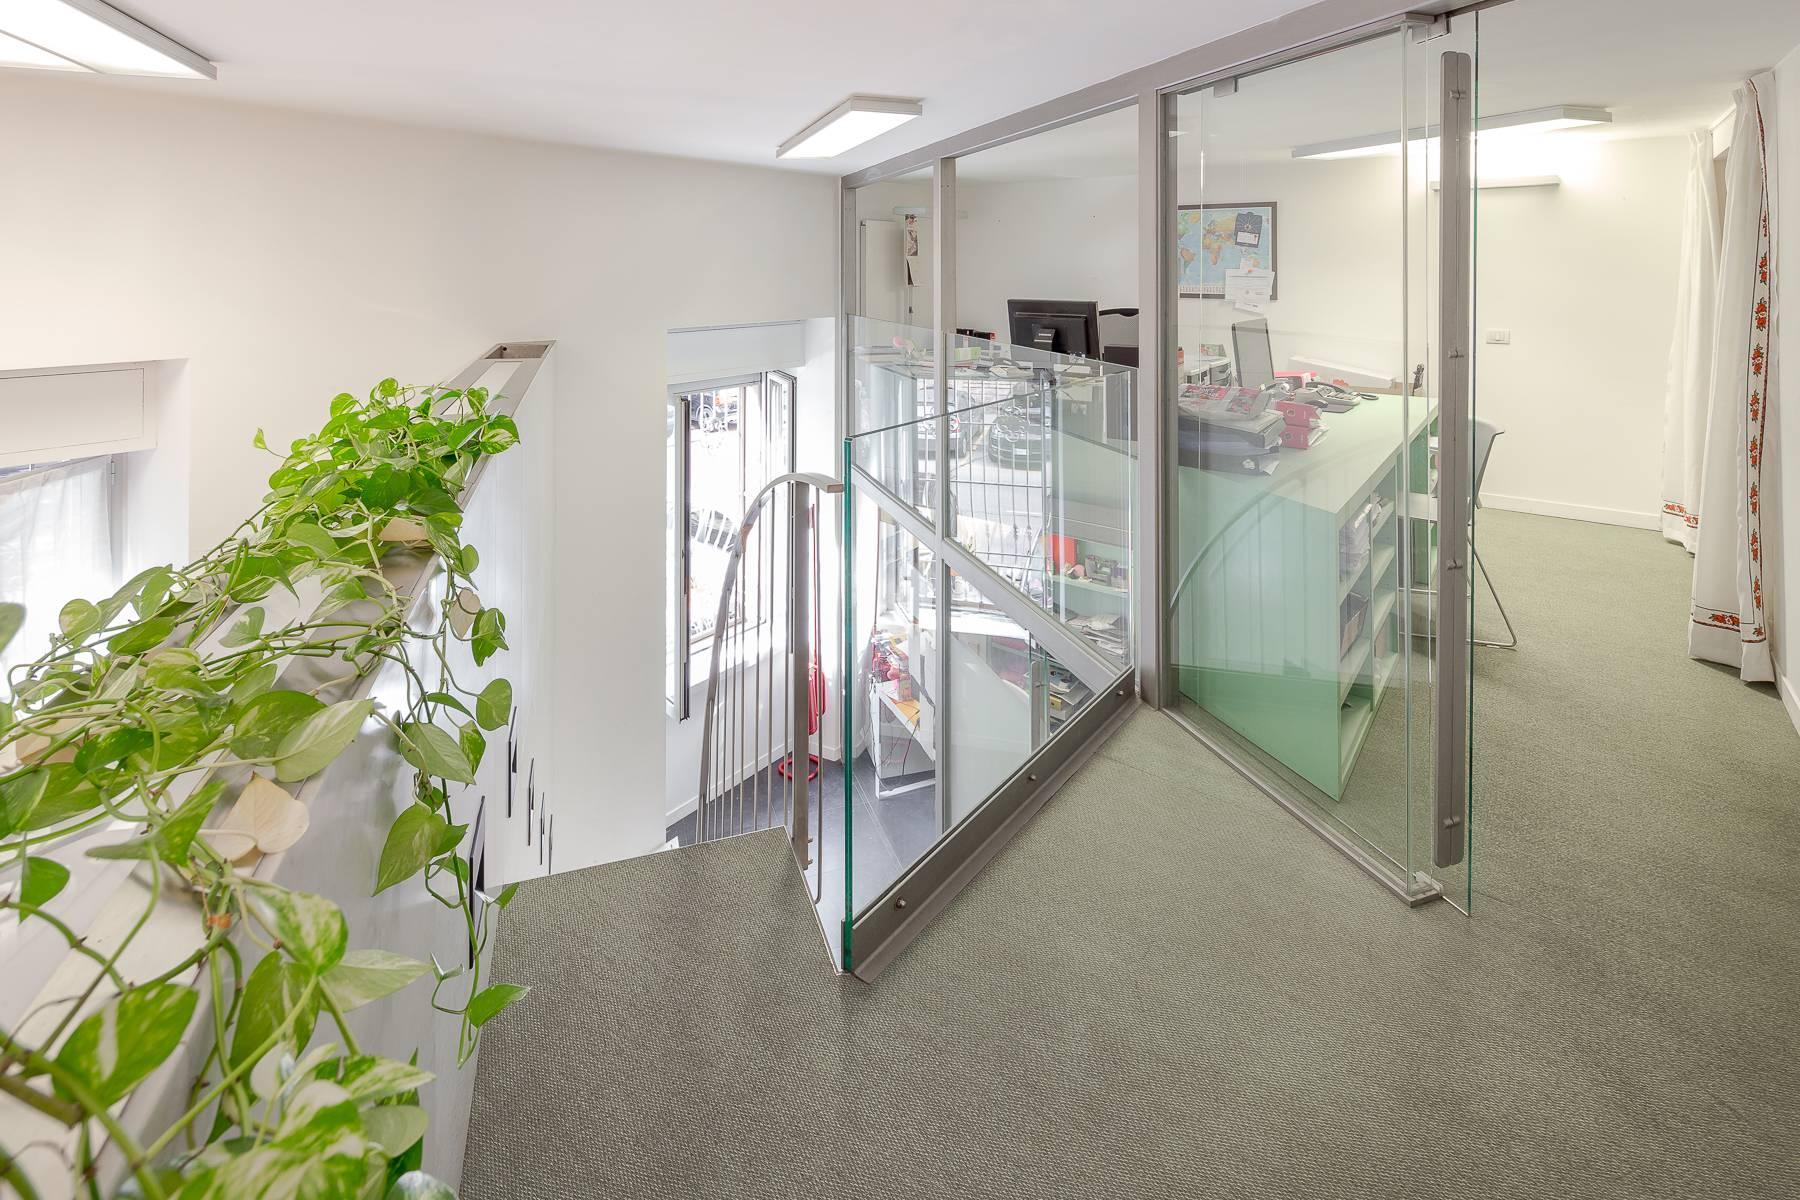 Opne-Space Büro / Wohnimmobilie auf der Piazza Giovine Italia / Via Aurelio Saffi - 16